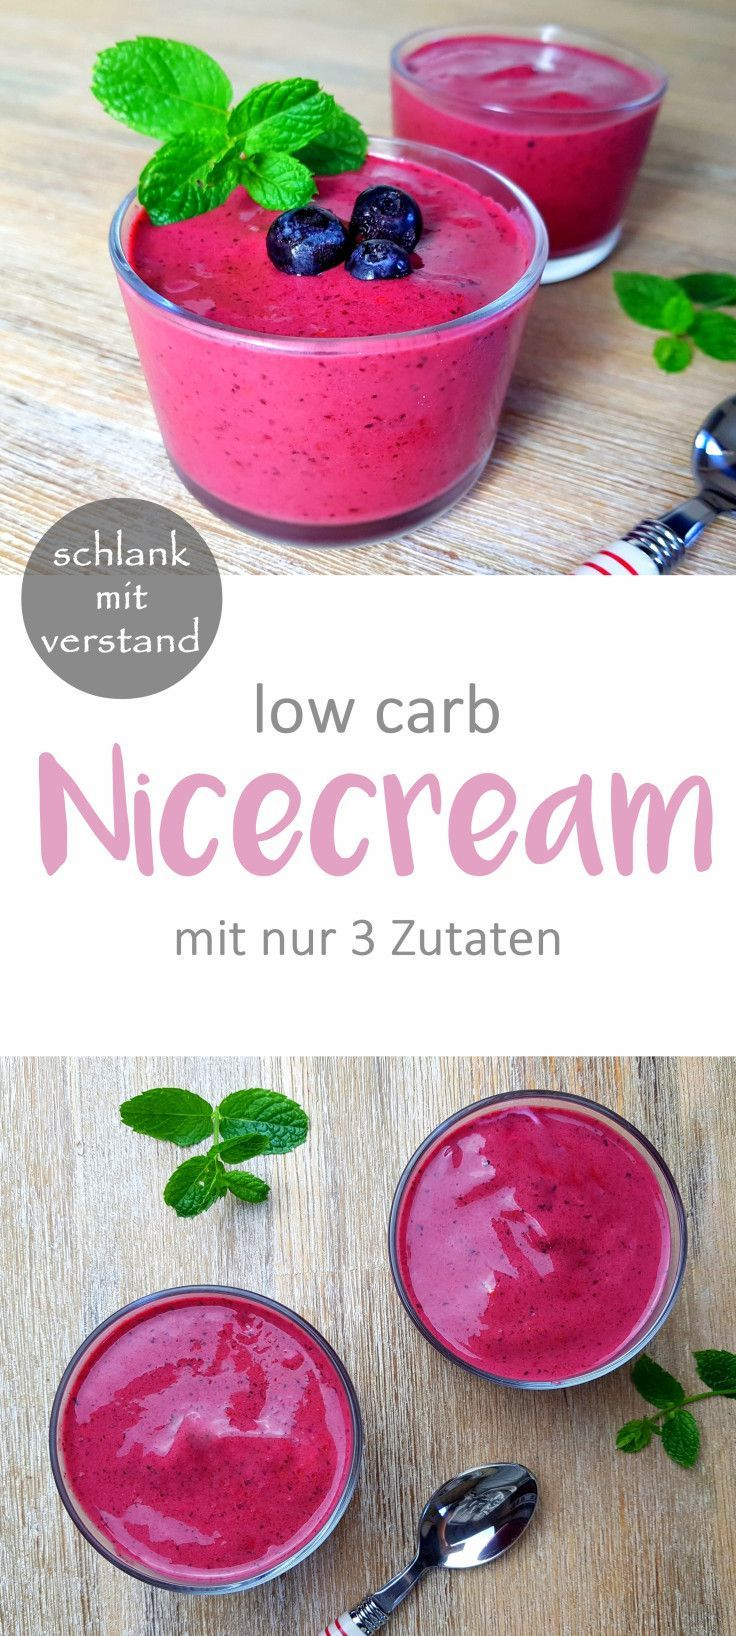 low carb Nicecream mit nur 3 Zutaten #lowcarbveggies